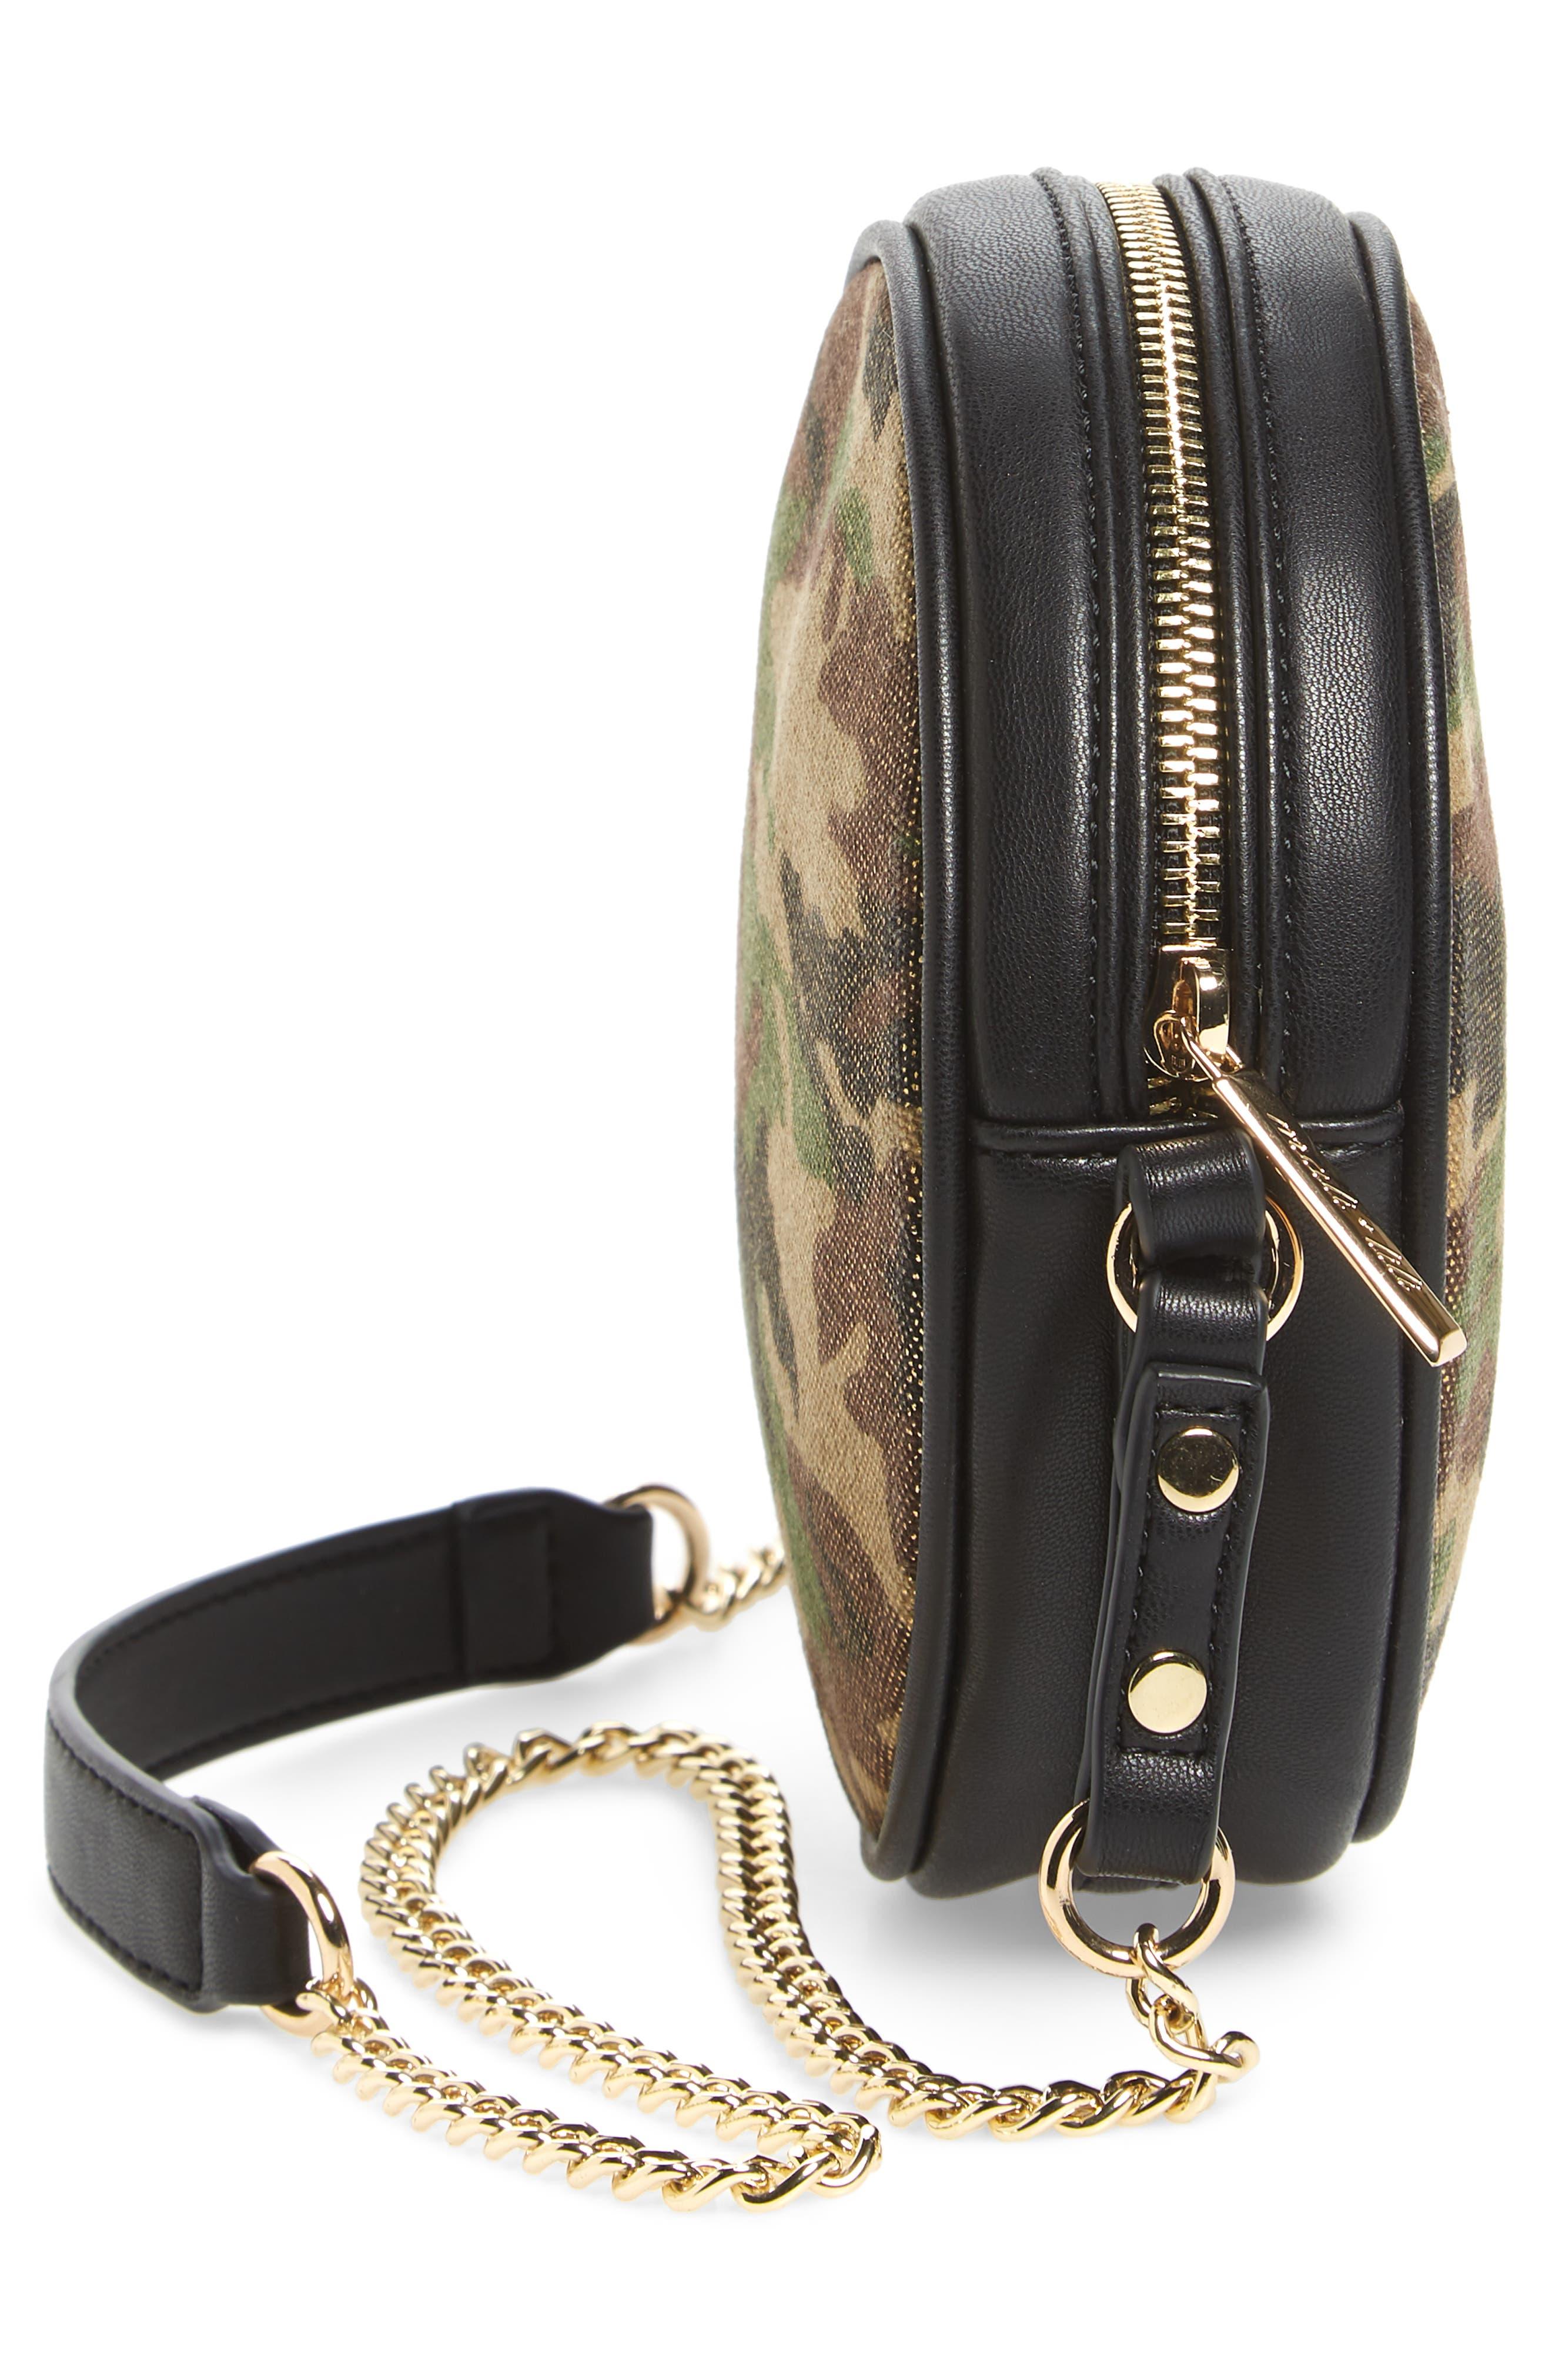 Mali + Lili Camouflage Vegan Leather Canteen Crossbody Bag,                             Alternate thumbnail 5, color,                             340